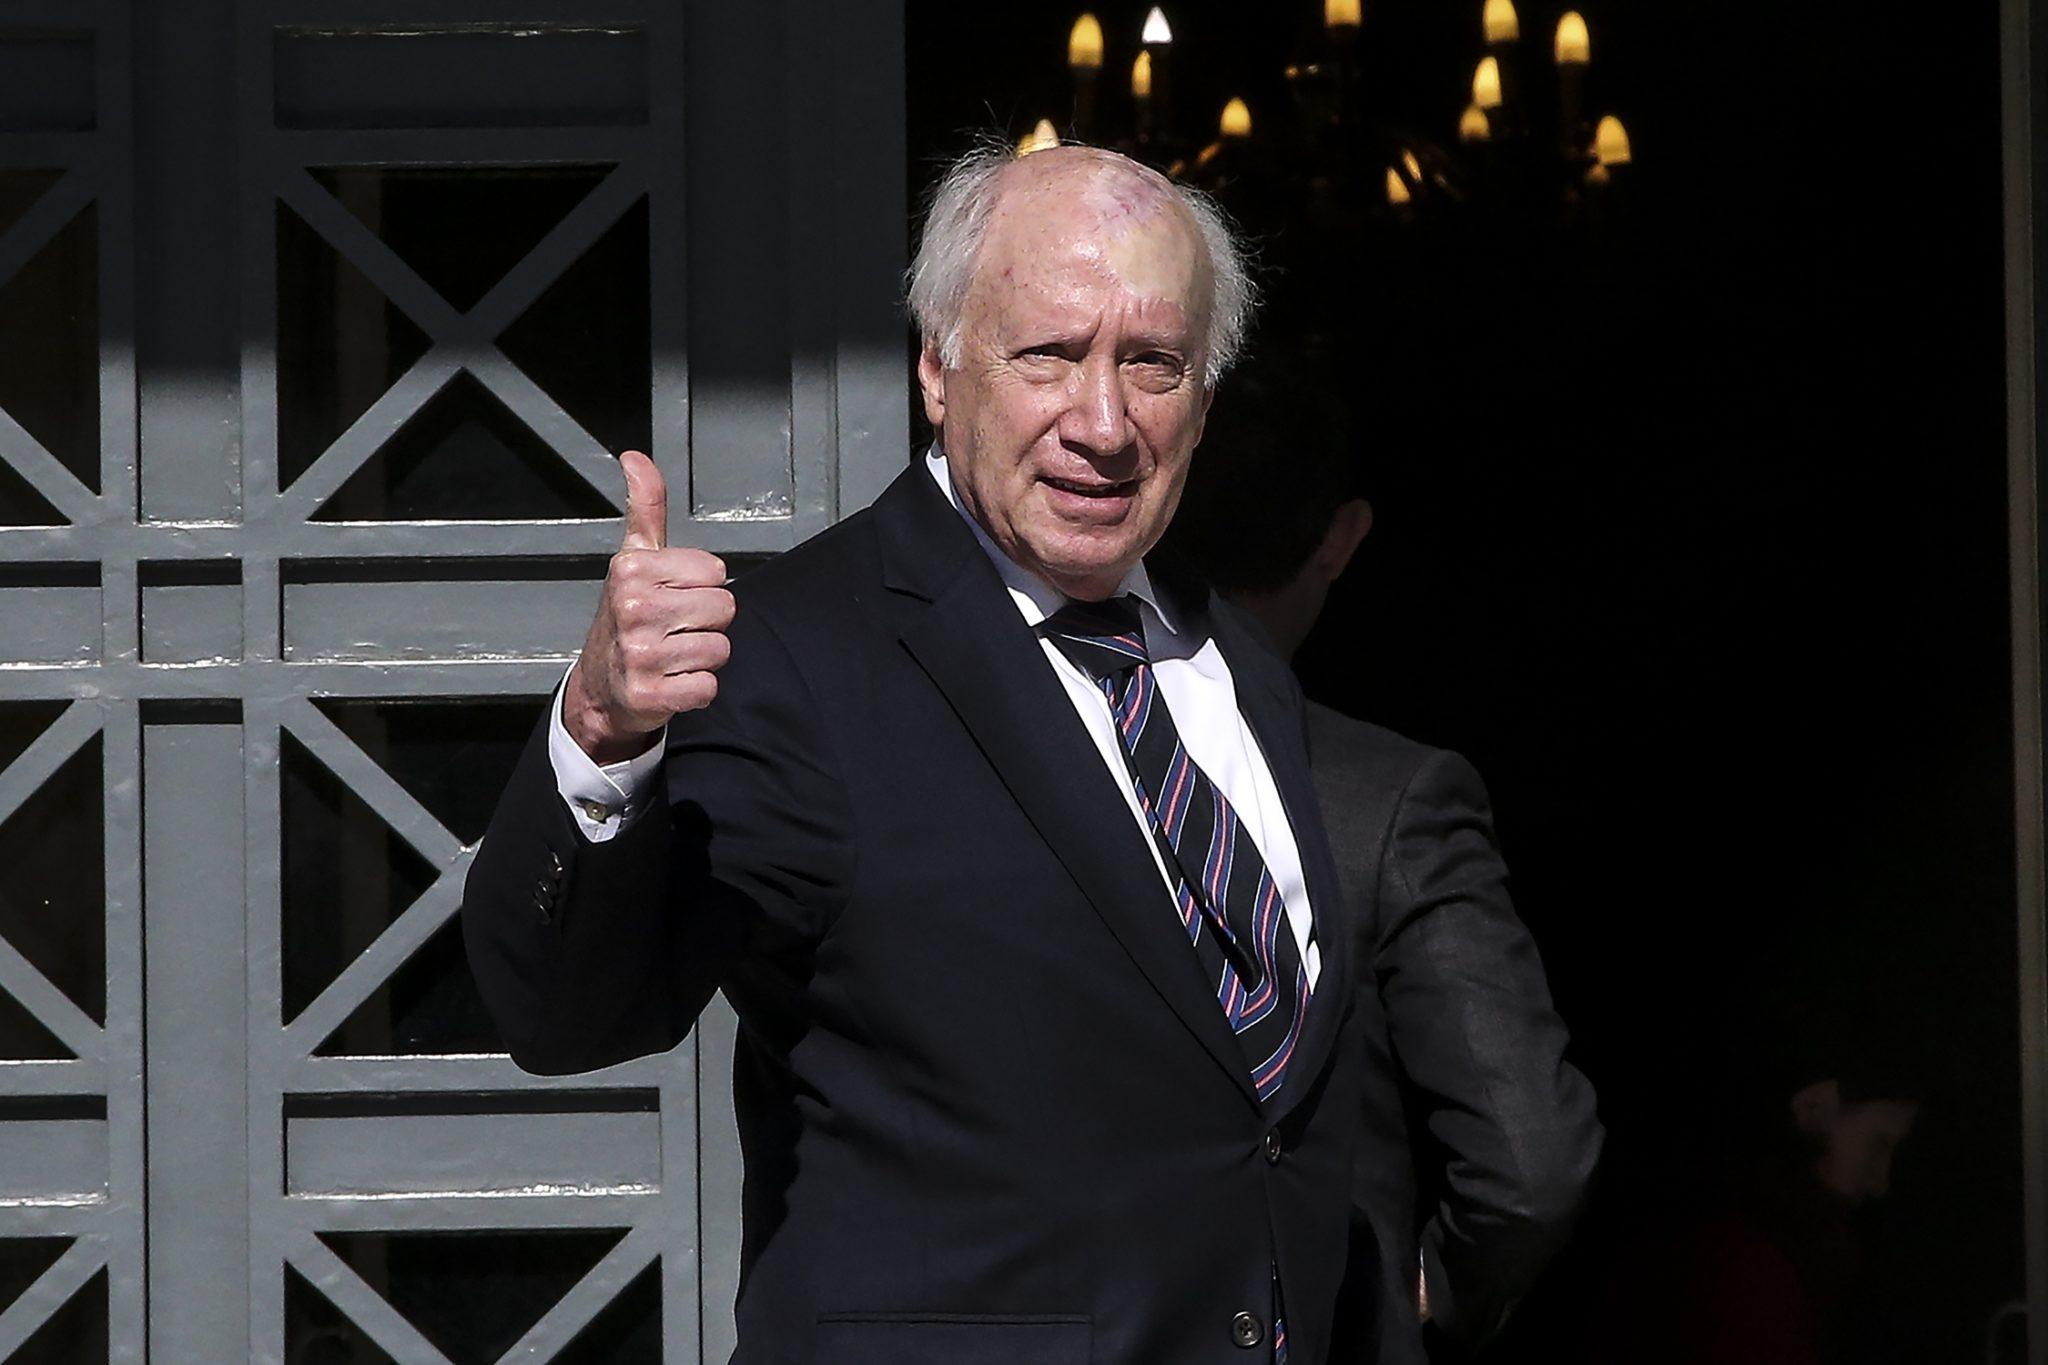 Xαιρετίζει τη συμφωνία ο Μάθιου Νίμιτς | to10.gr